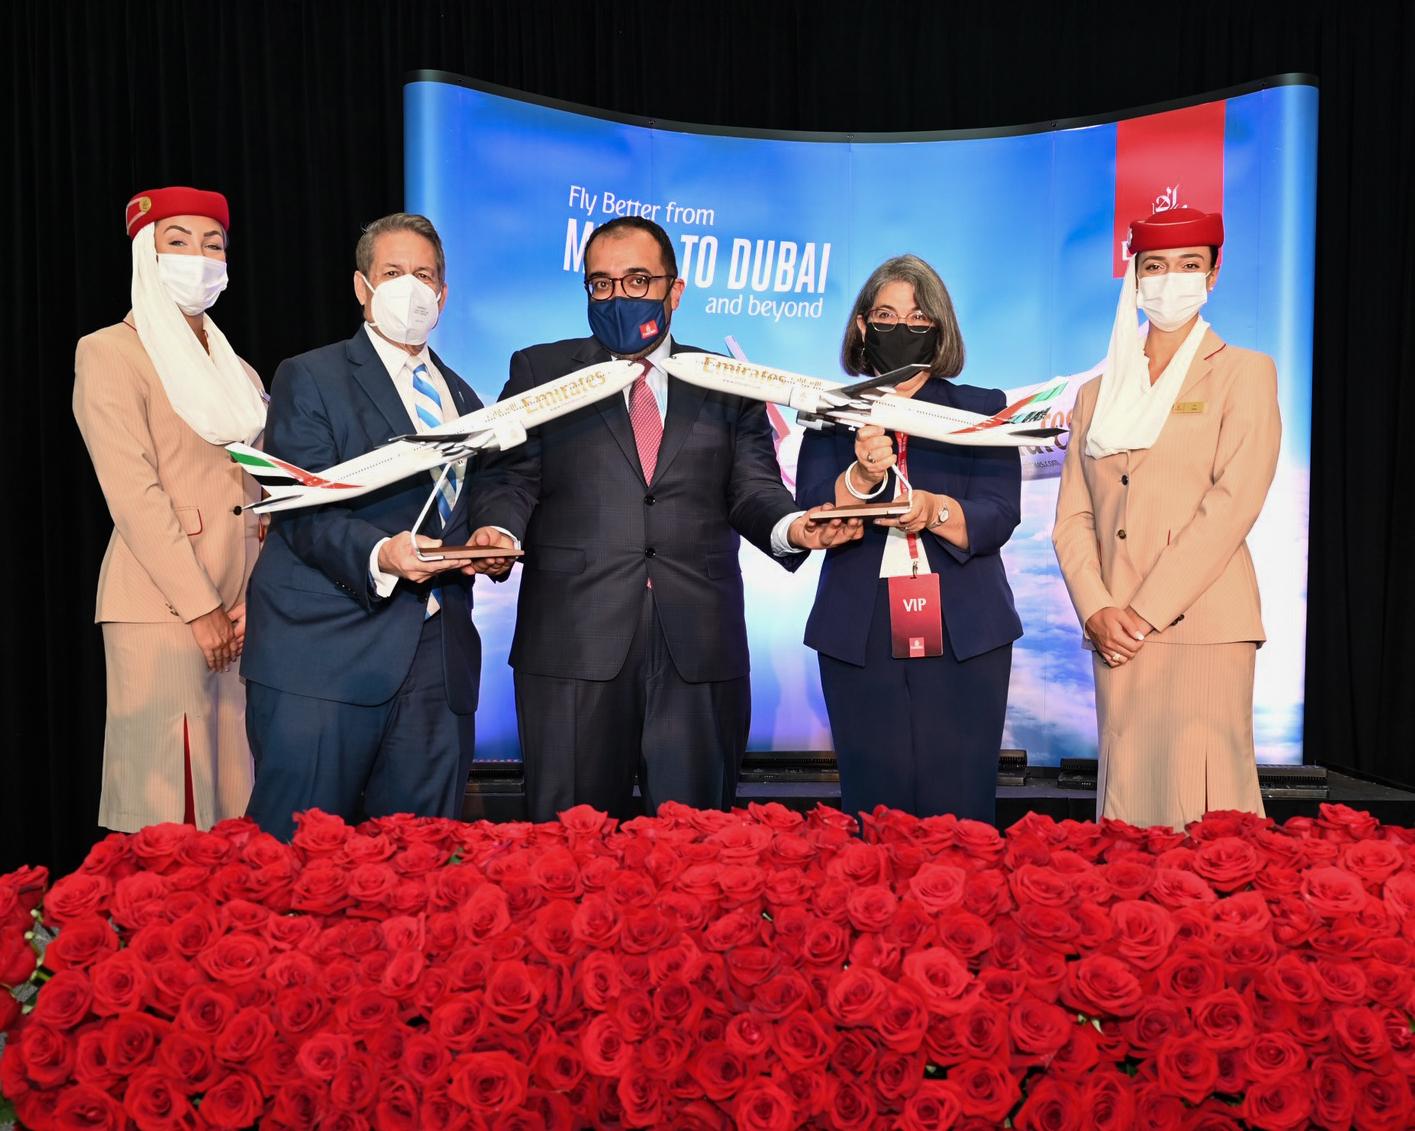 Emirates Launches New Route to Miami